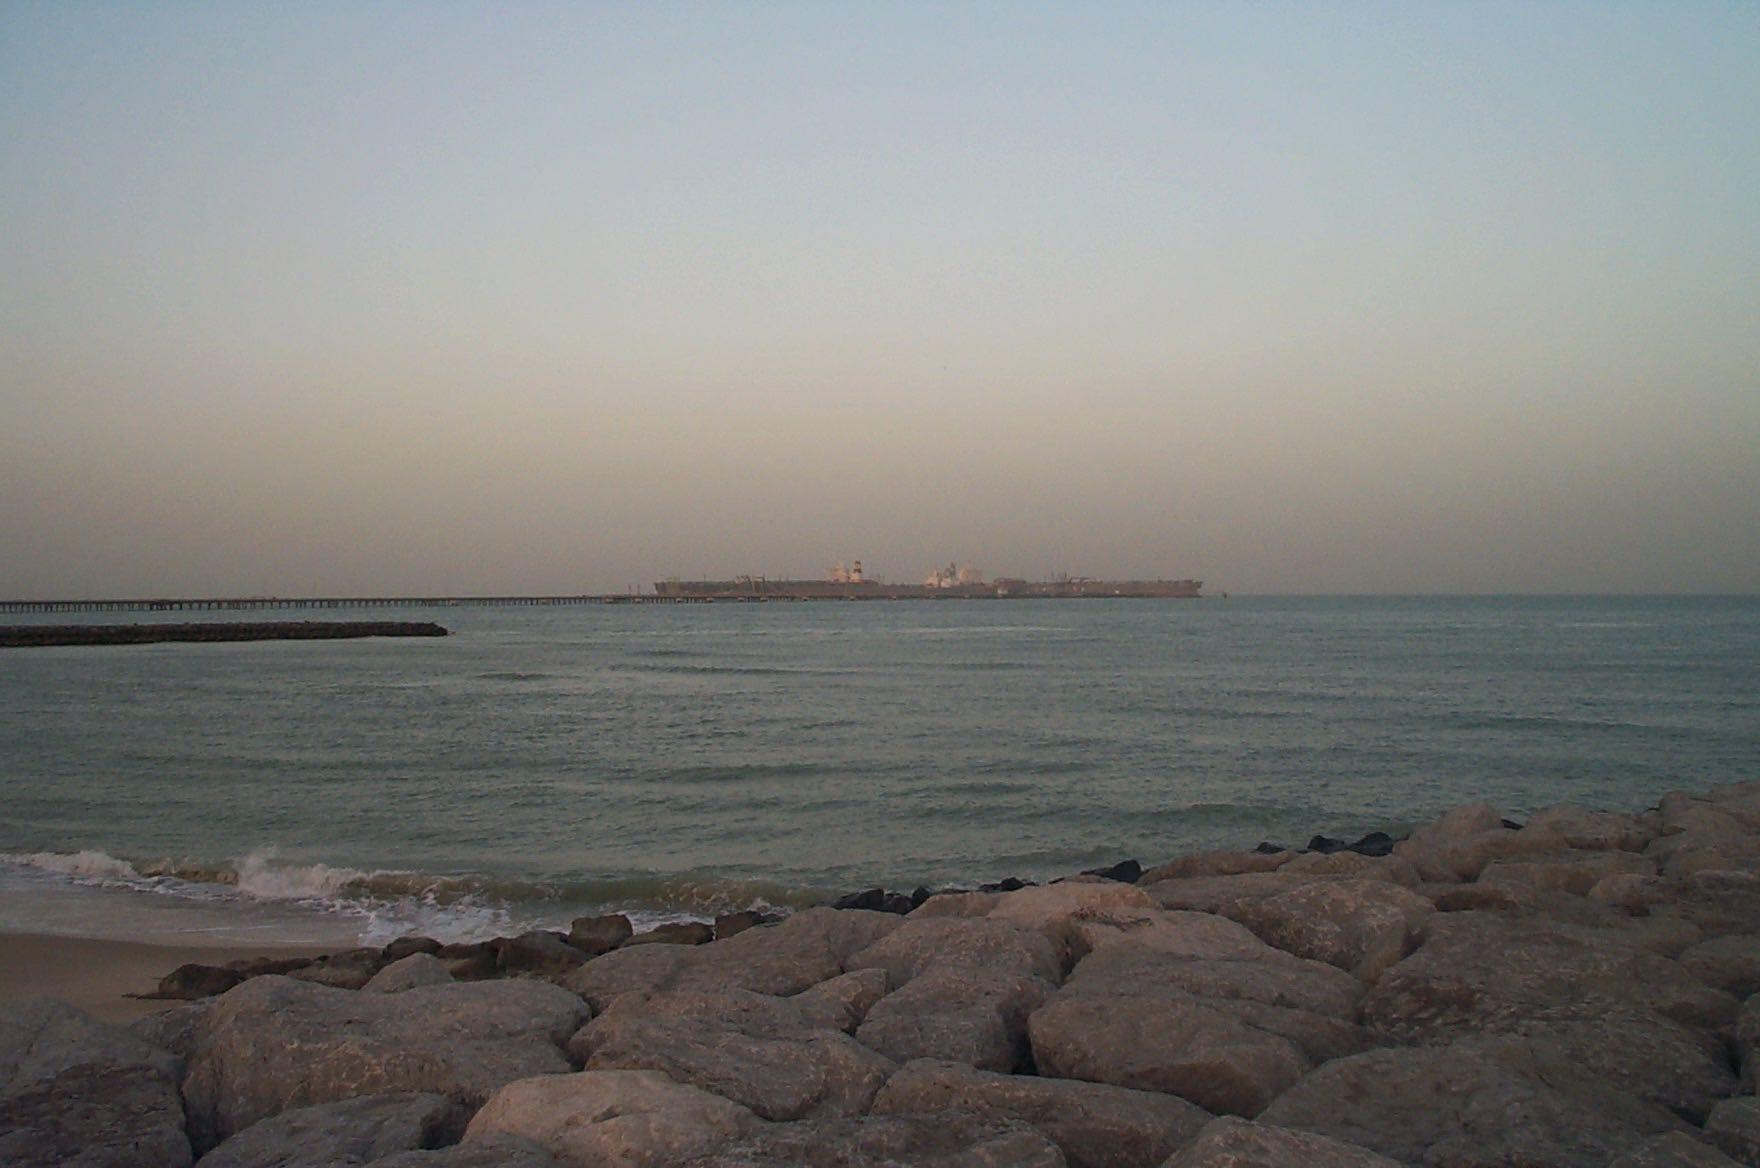 Offshore oil terminal, Kuwait.